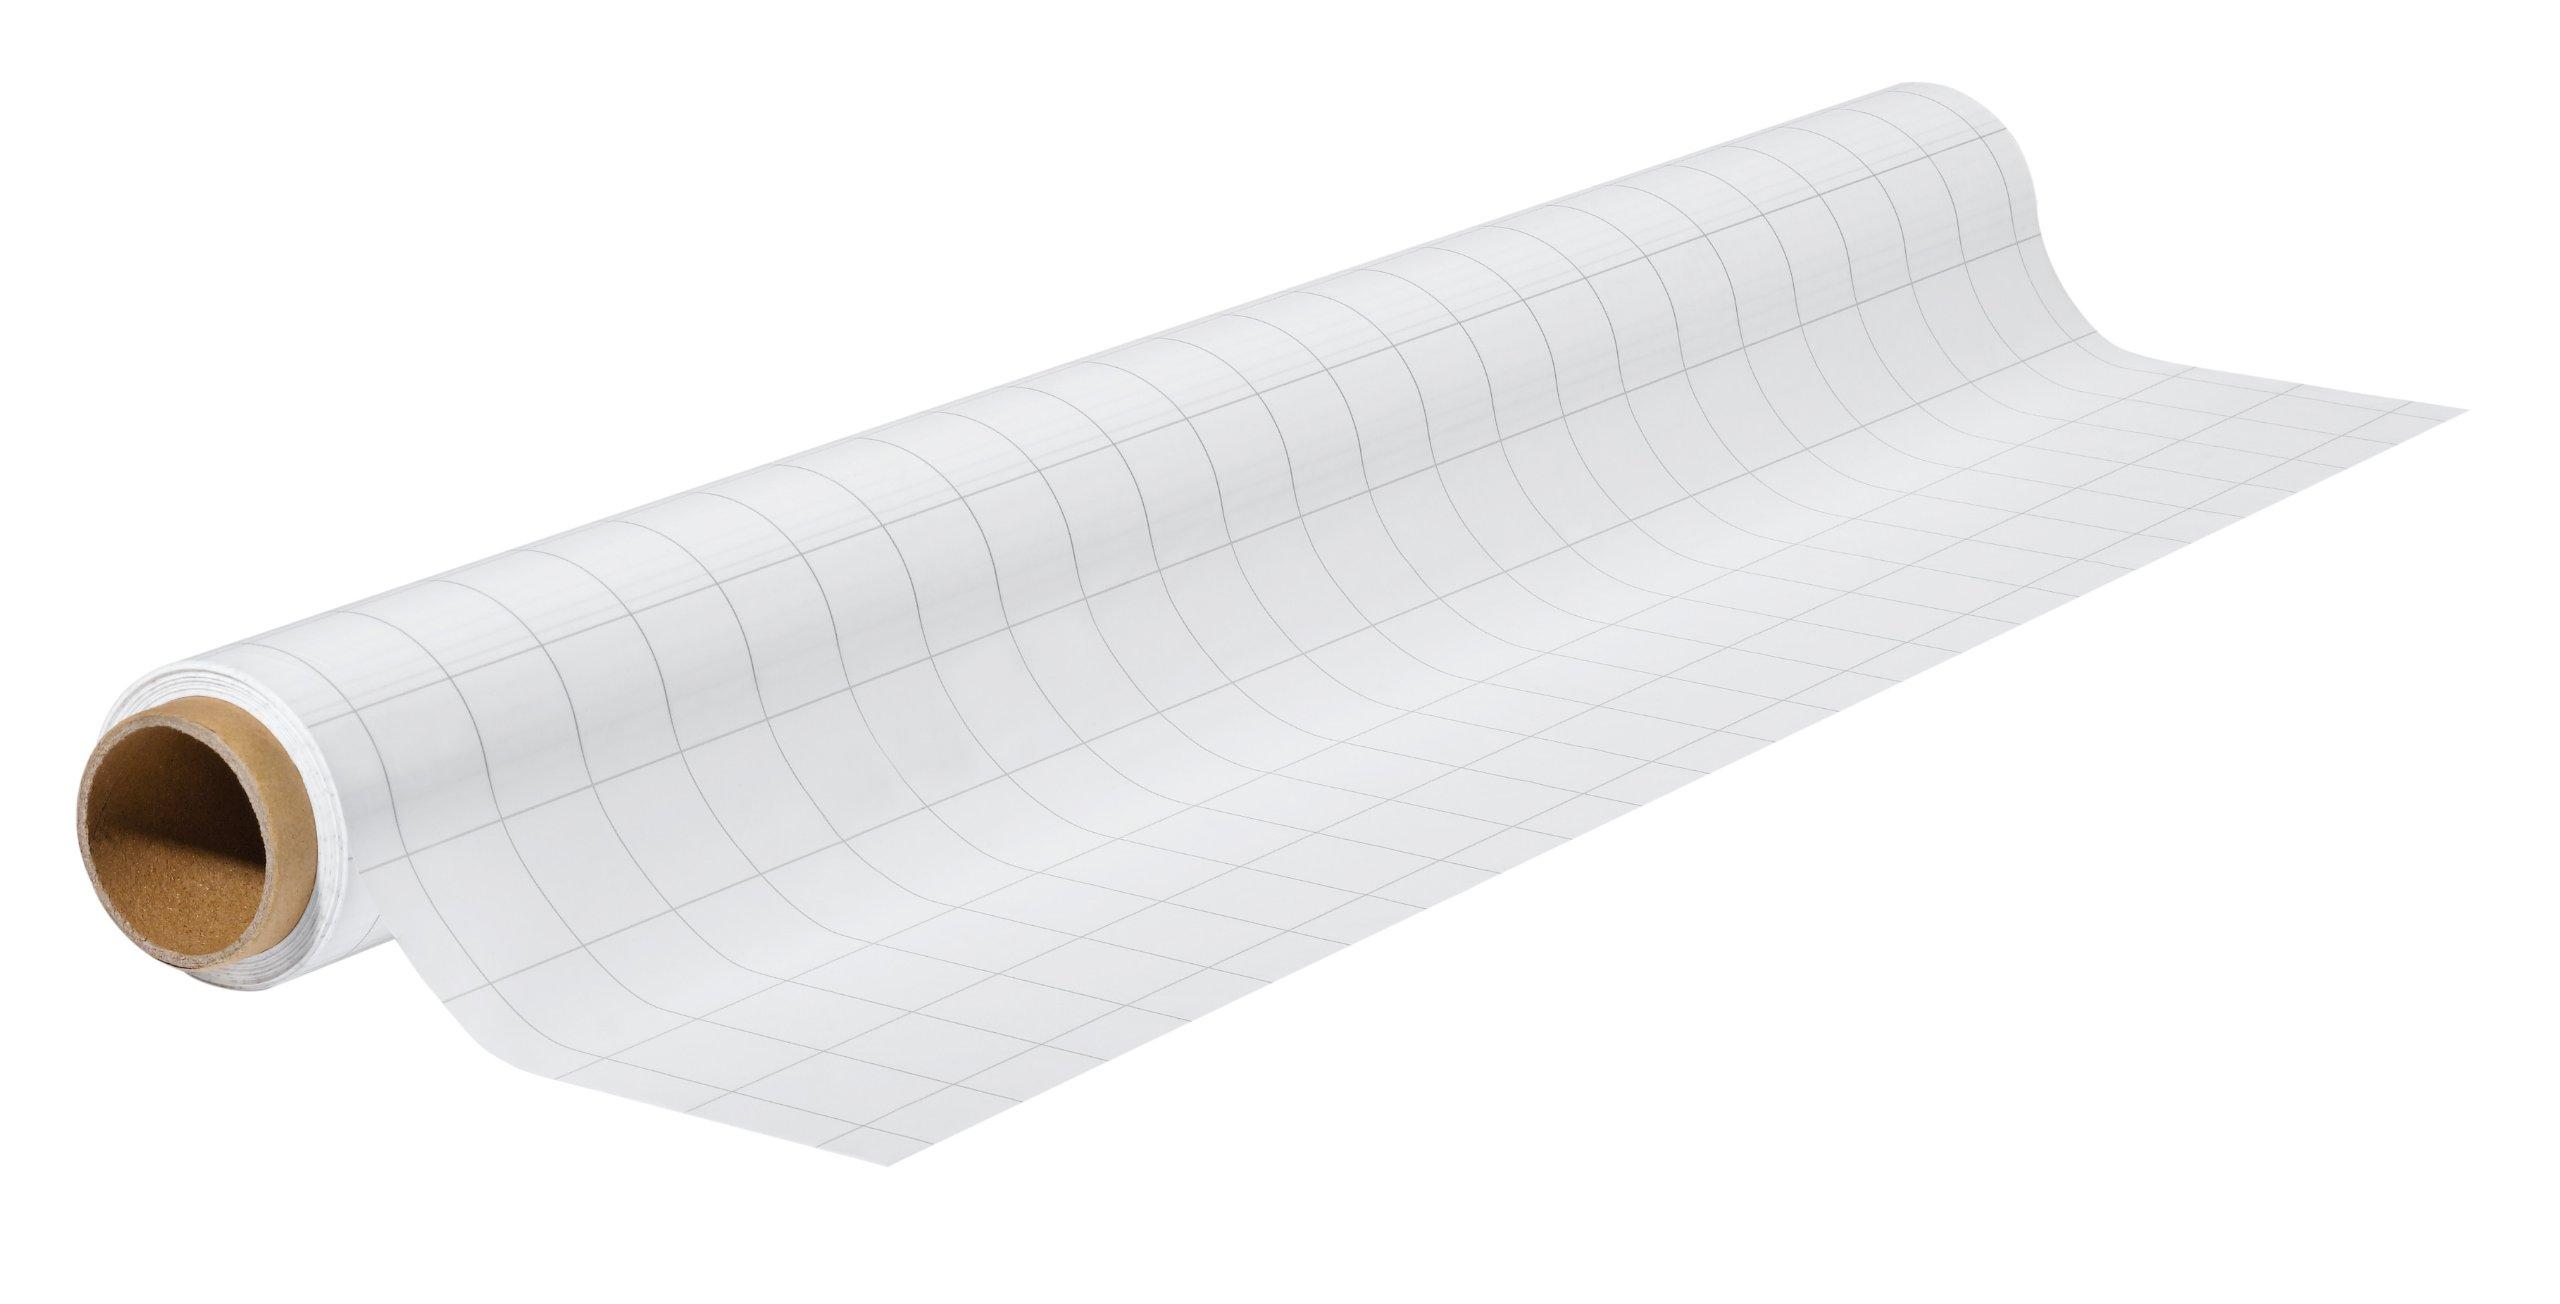 Franken X-tra Line SF2011 Flip Chart Film Polypropylene 0.8 m x 60 cm Squared White